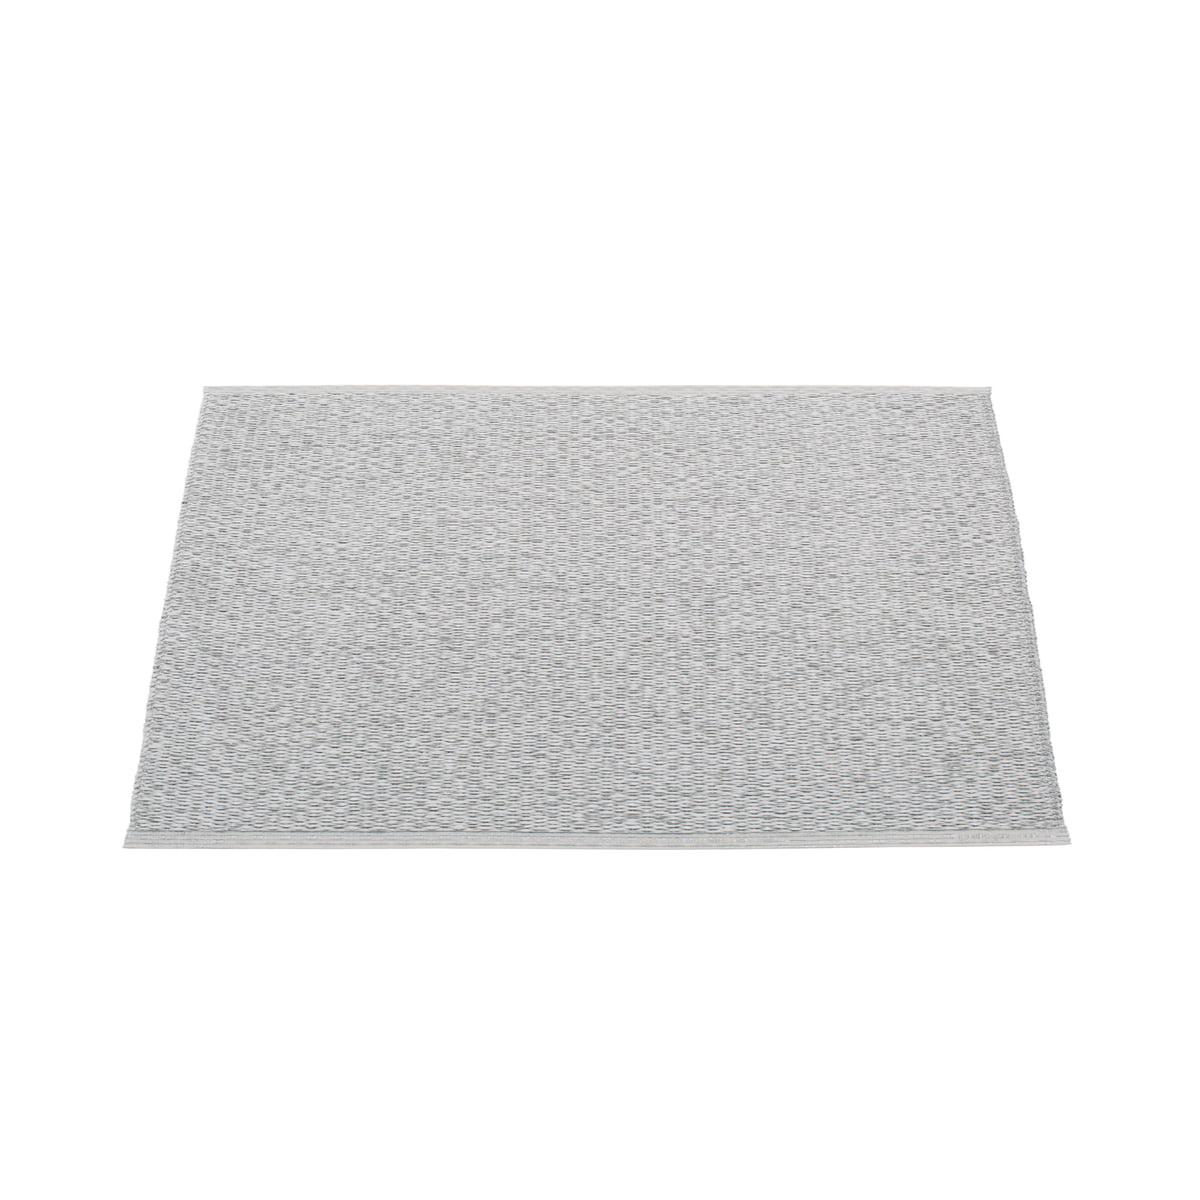 svea rug 70 cm by pappelina connox. Black Bedroom Furniture Sets. Home Design Ideas